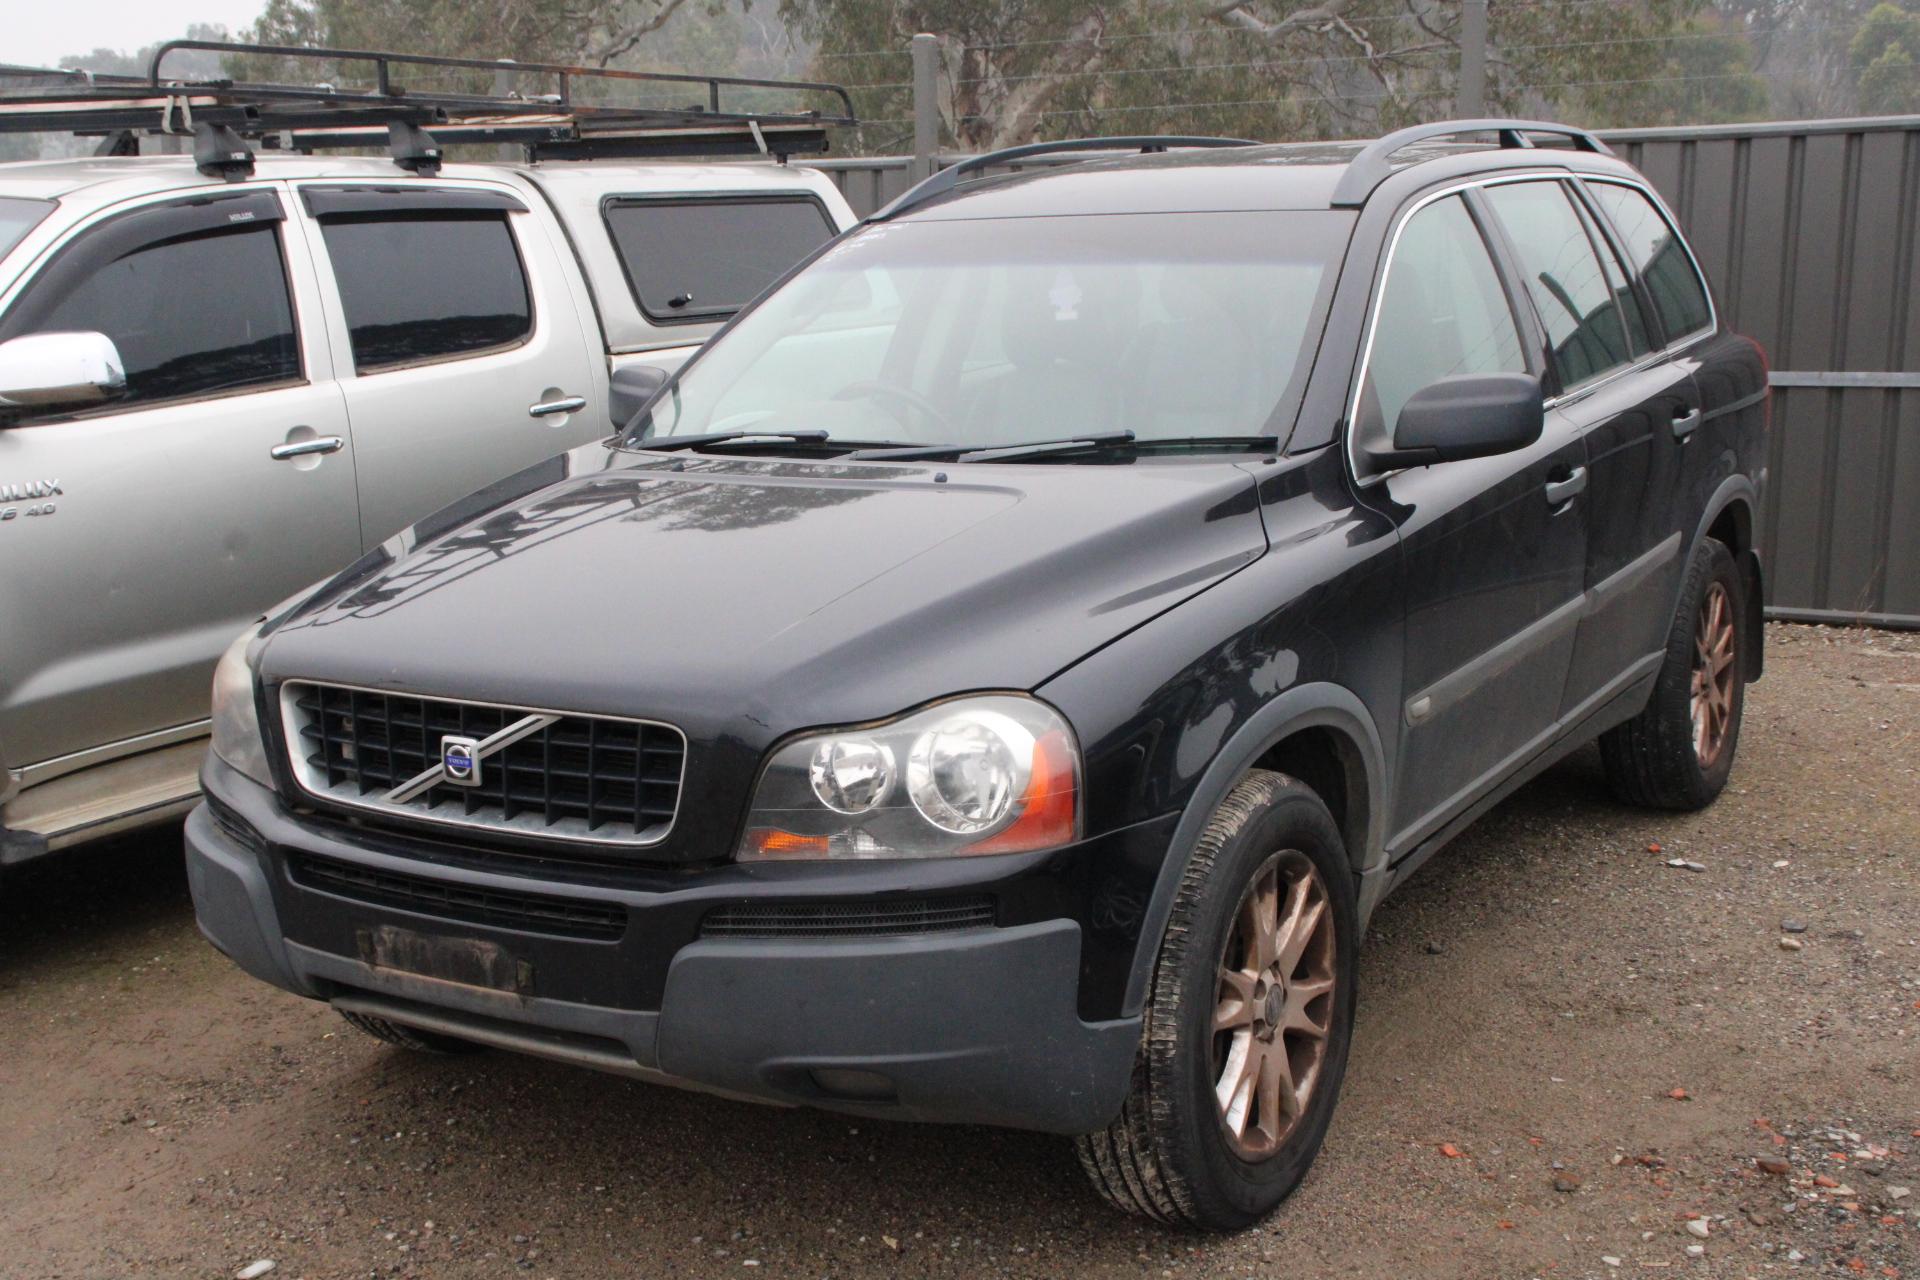 2006 Volvo XC90 Lifestyle Edition (LE) Automatic 7 Seats Wagon